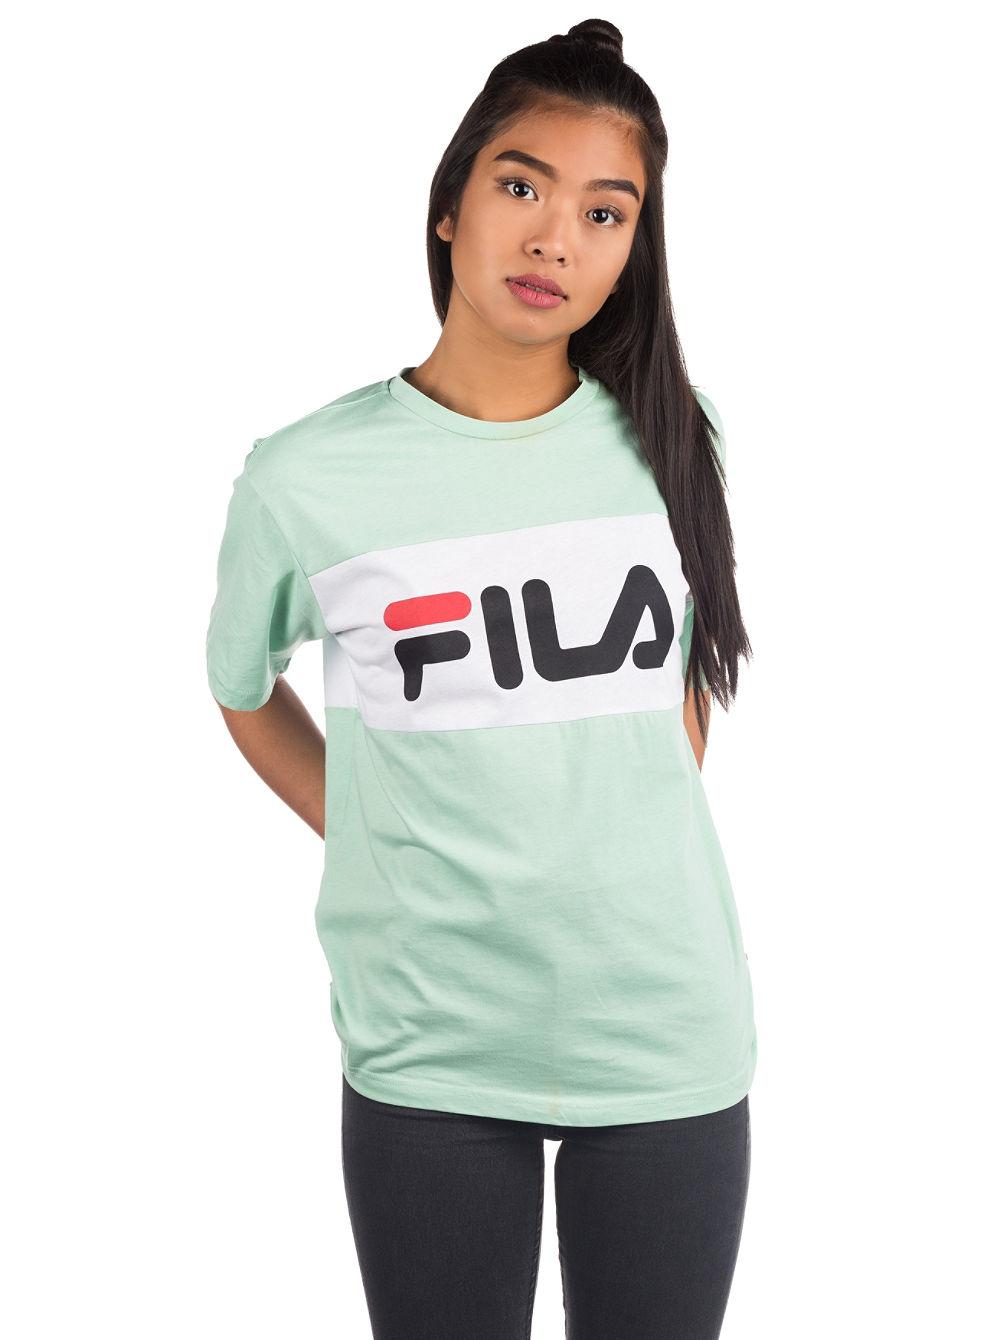 690437192a Buy Fila Allison T-Shirt online at Blue Tomato